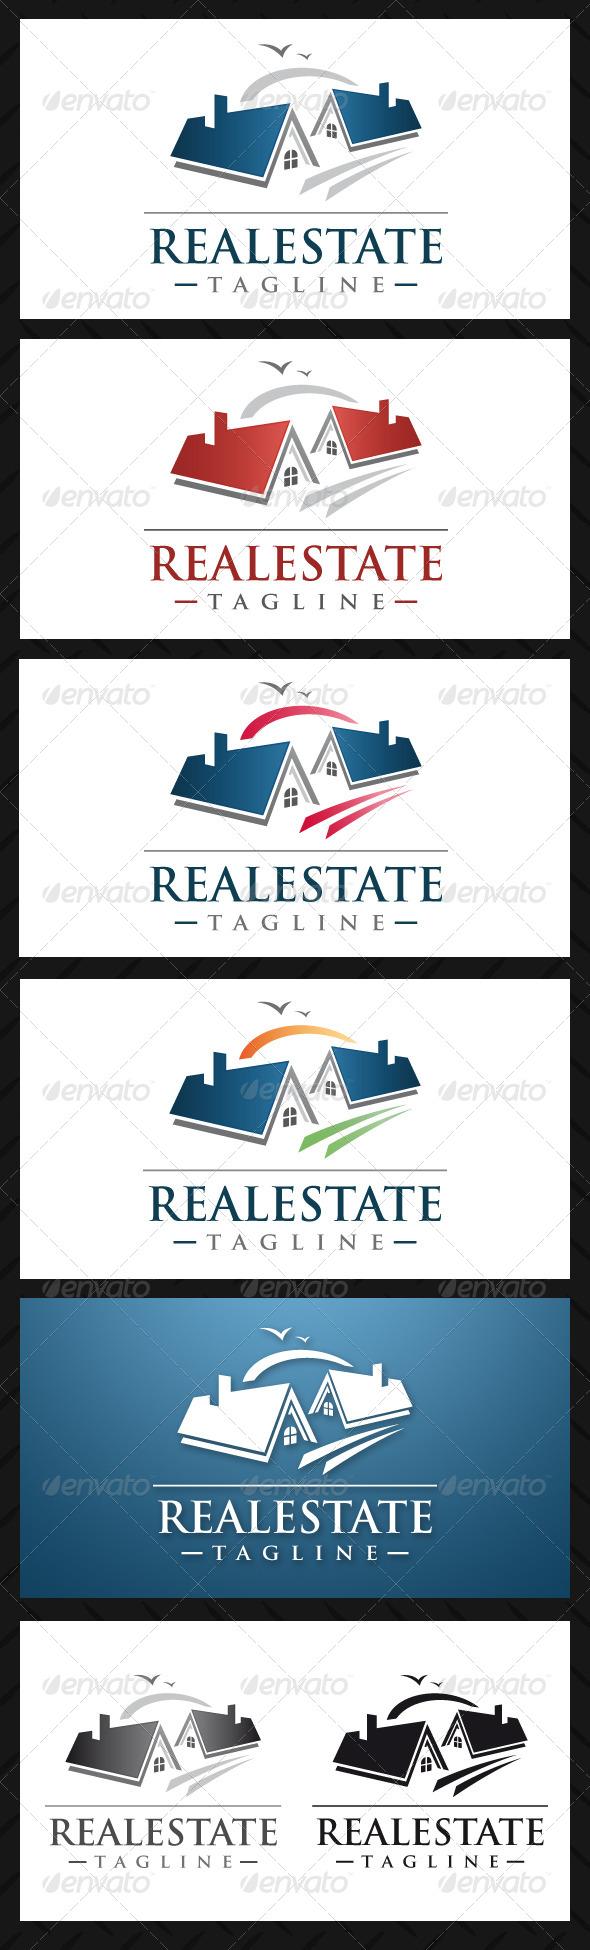 Real Estate Professional Logo Template